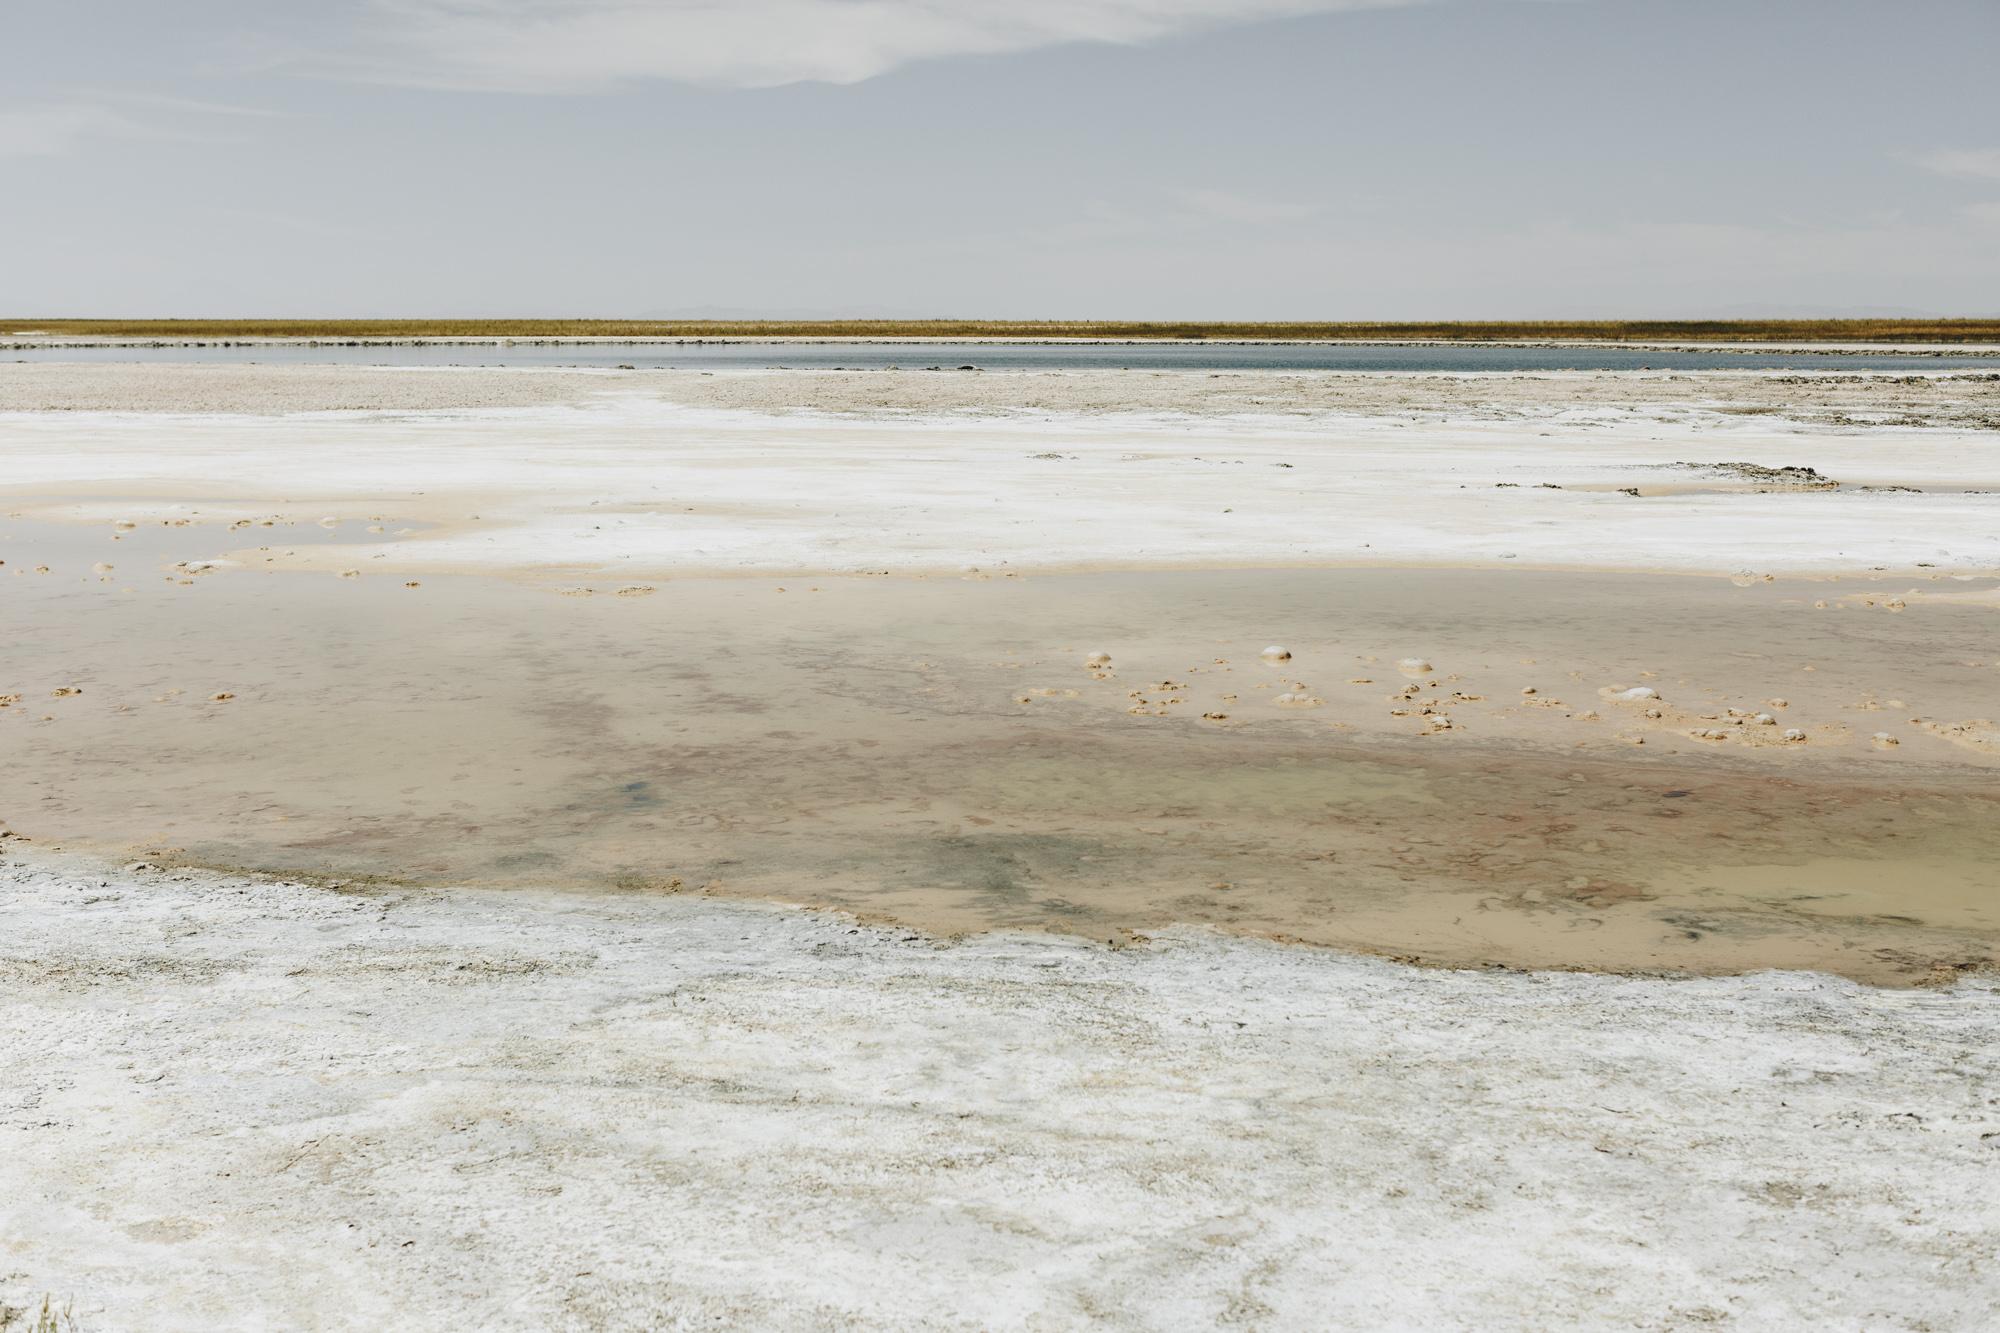 Mael Lambla photographer Chile San pedro atacama desert-44.jpg